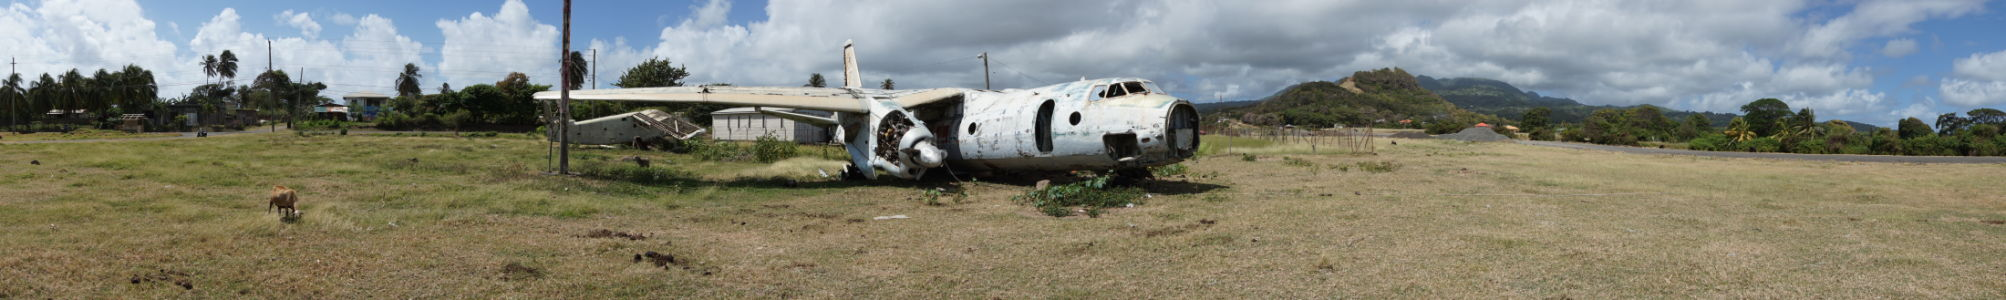 Vraky lietadiel na grenadskom letisku Pearl Airport